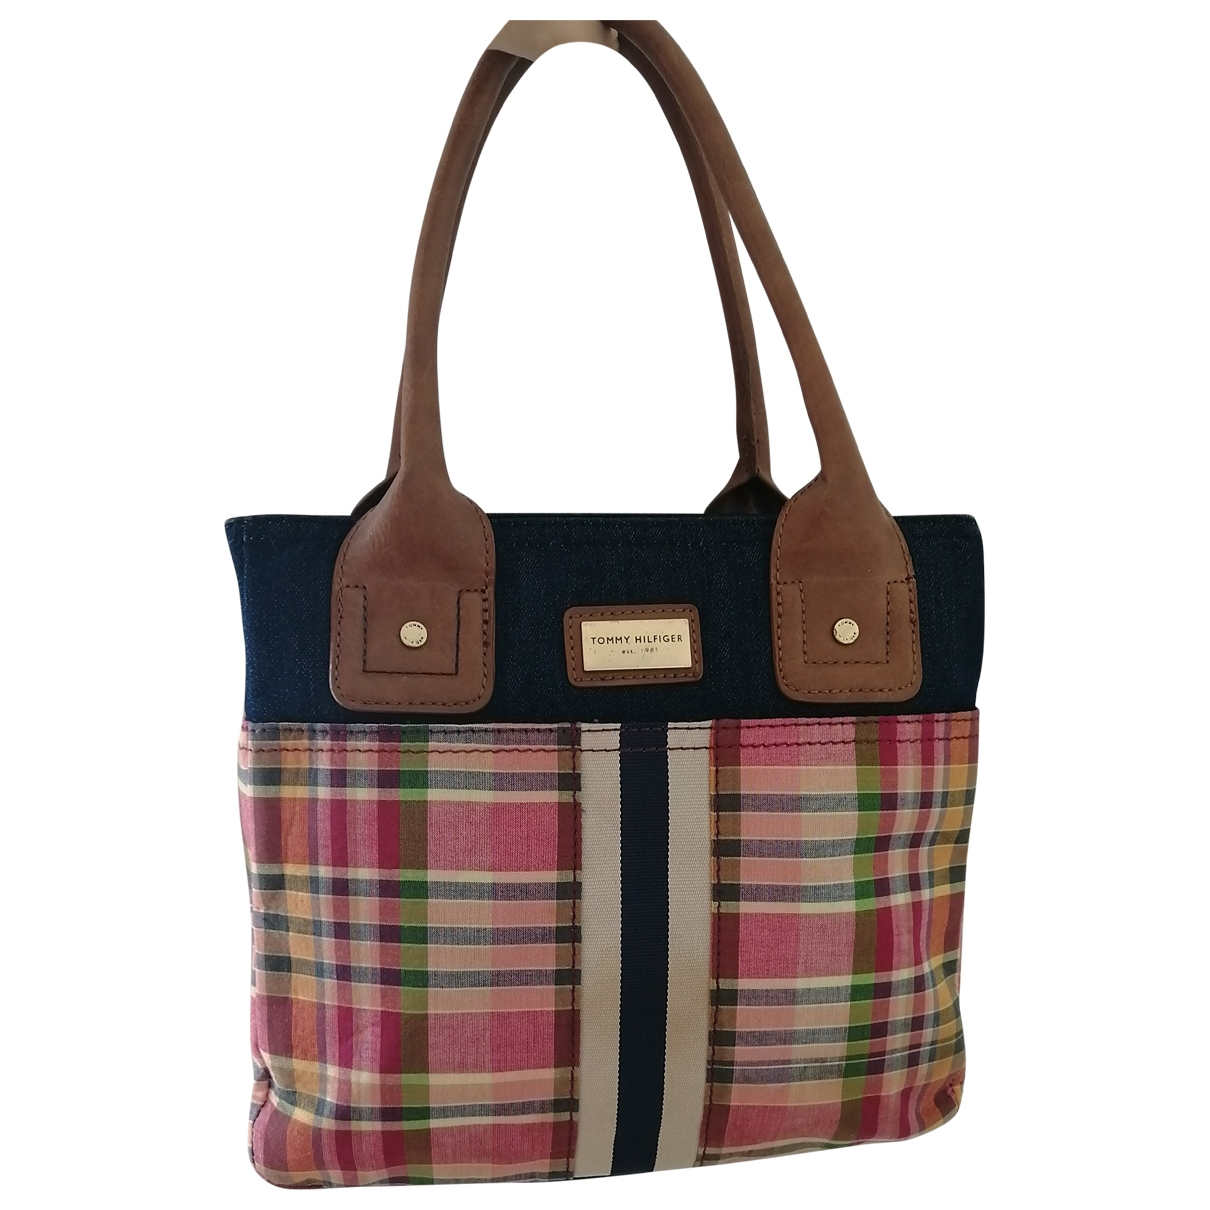 Tommy Hilfiger \N Multicolour Denim - Jeans handbag for Women \N